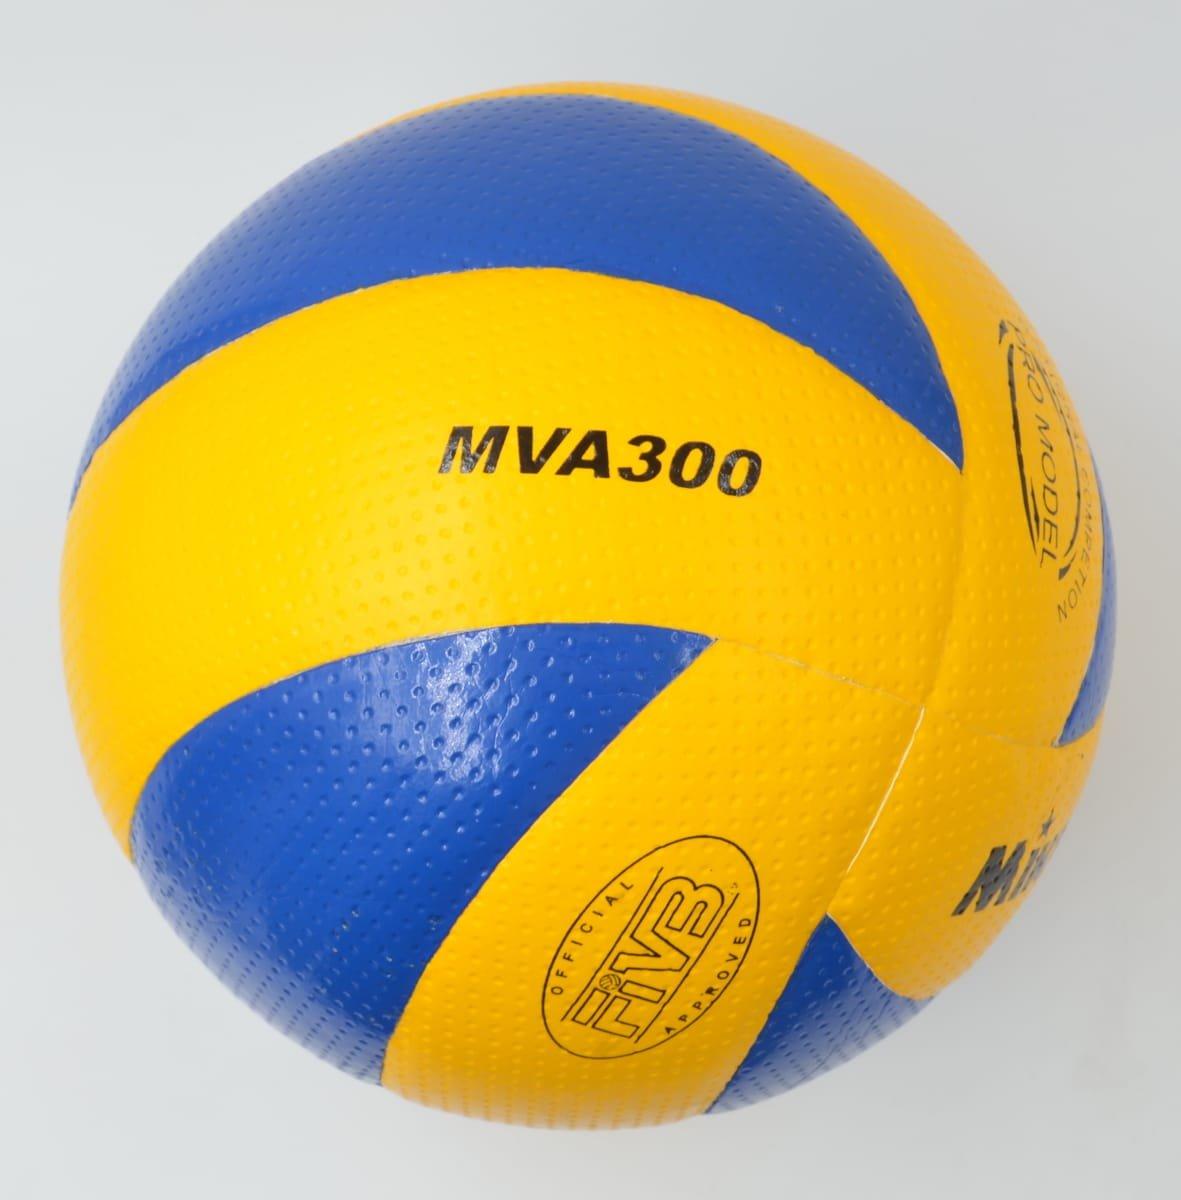 Mikasa MVA300 Olympic Indoor Volleyball, Blue/Yellow